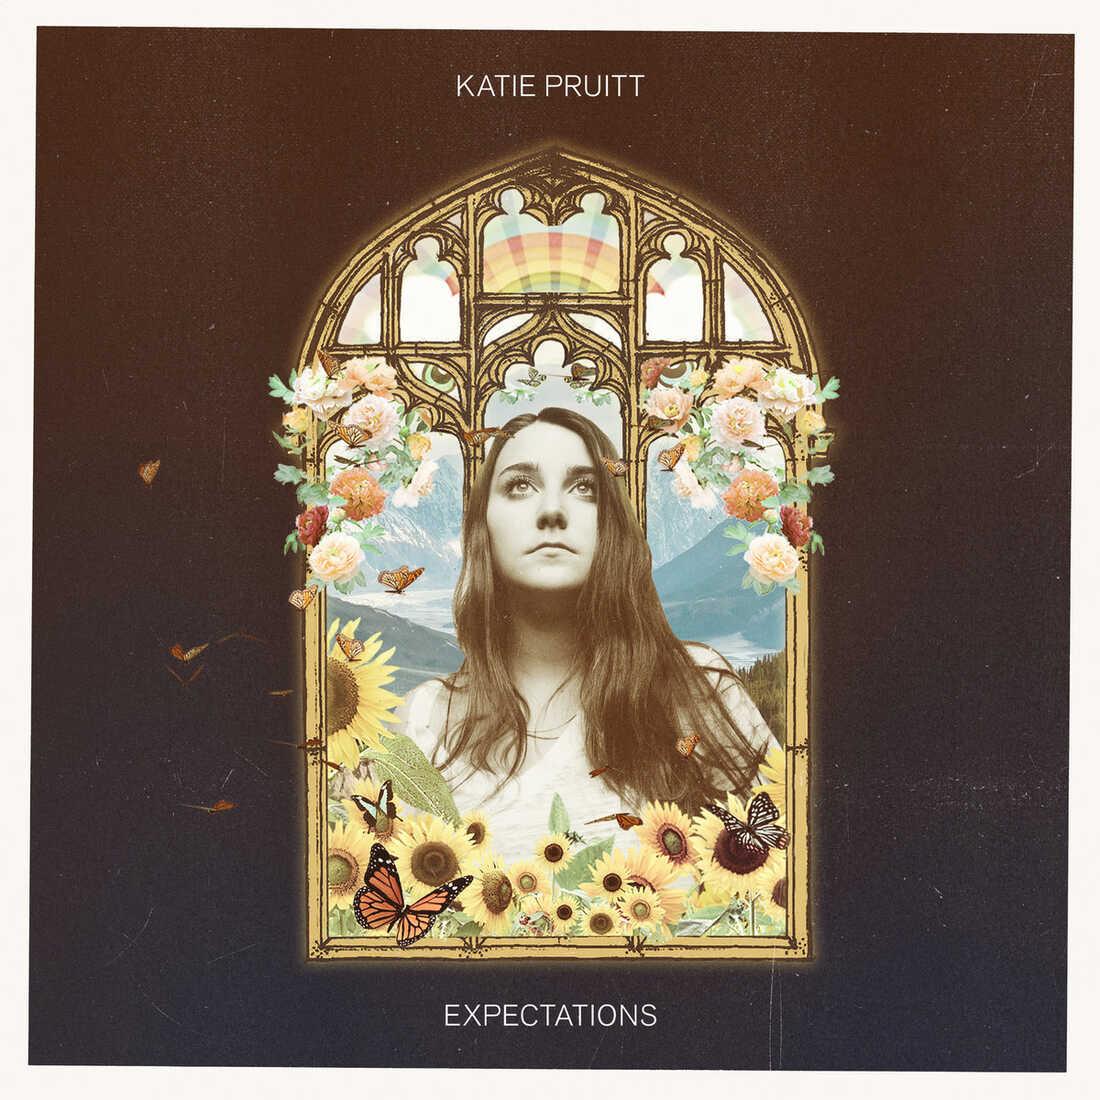 Katie Pruitt, Expectations